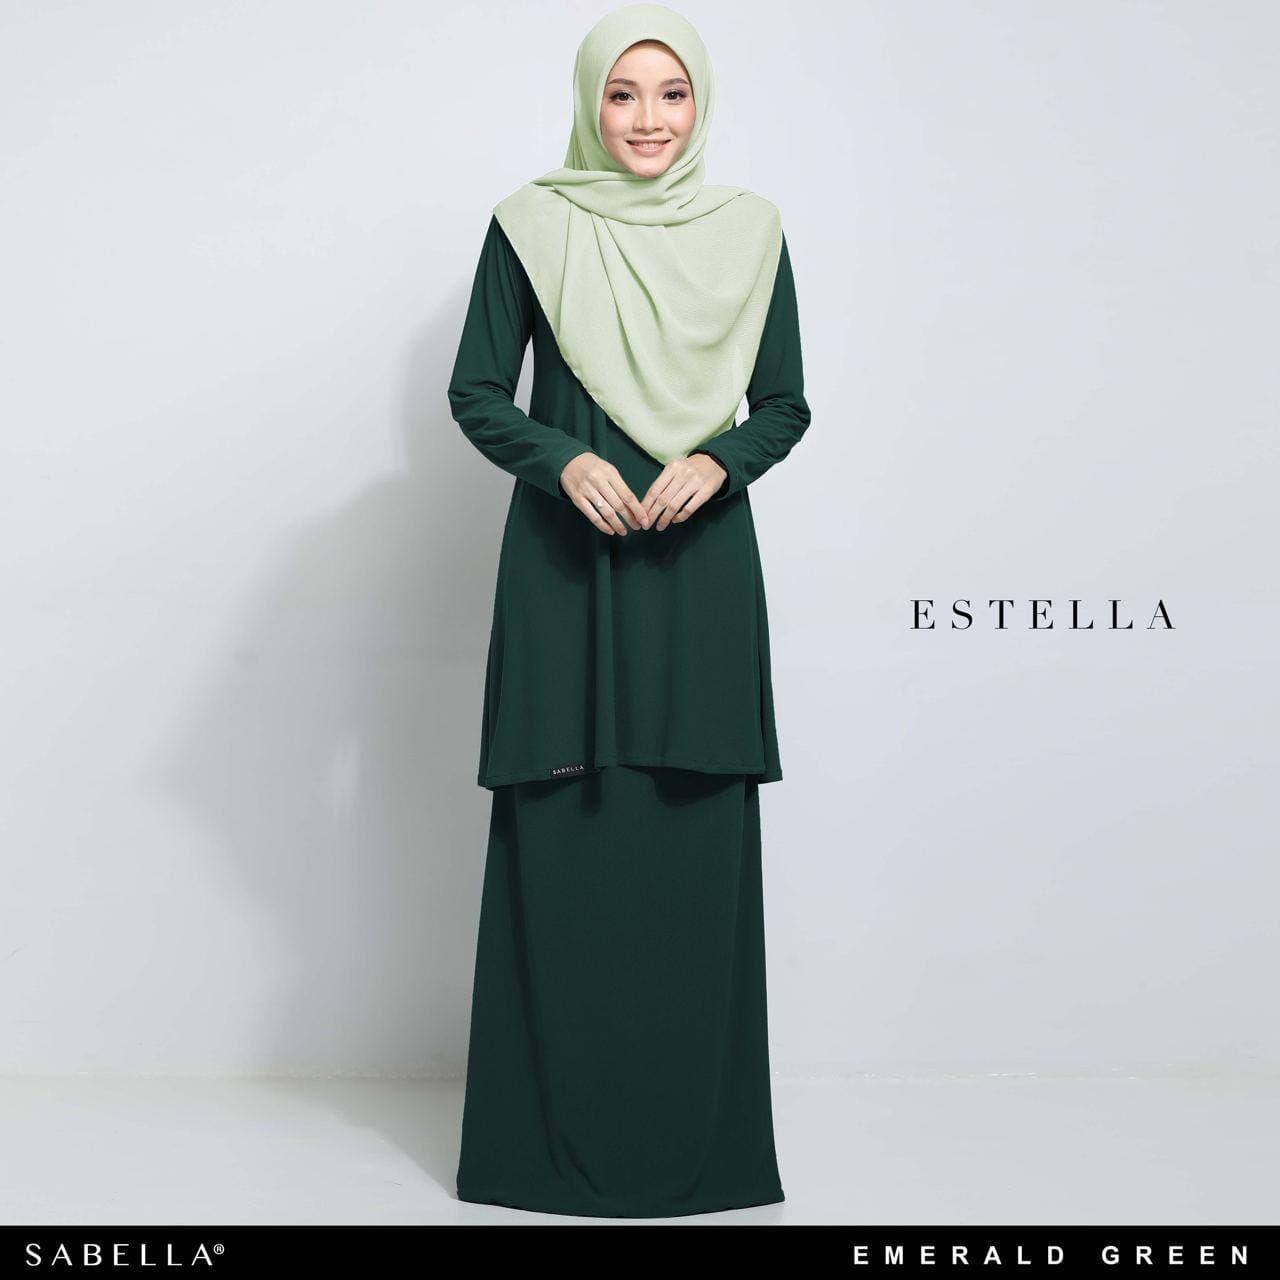 Estella 2.0 Emerald Green (R)